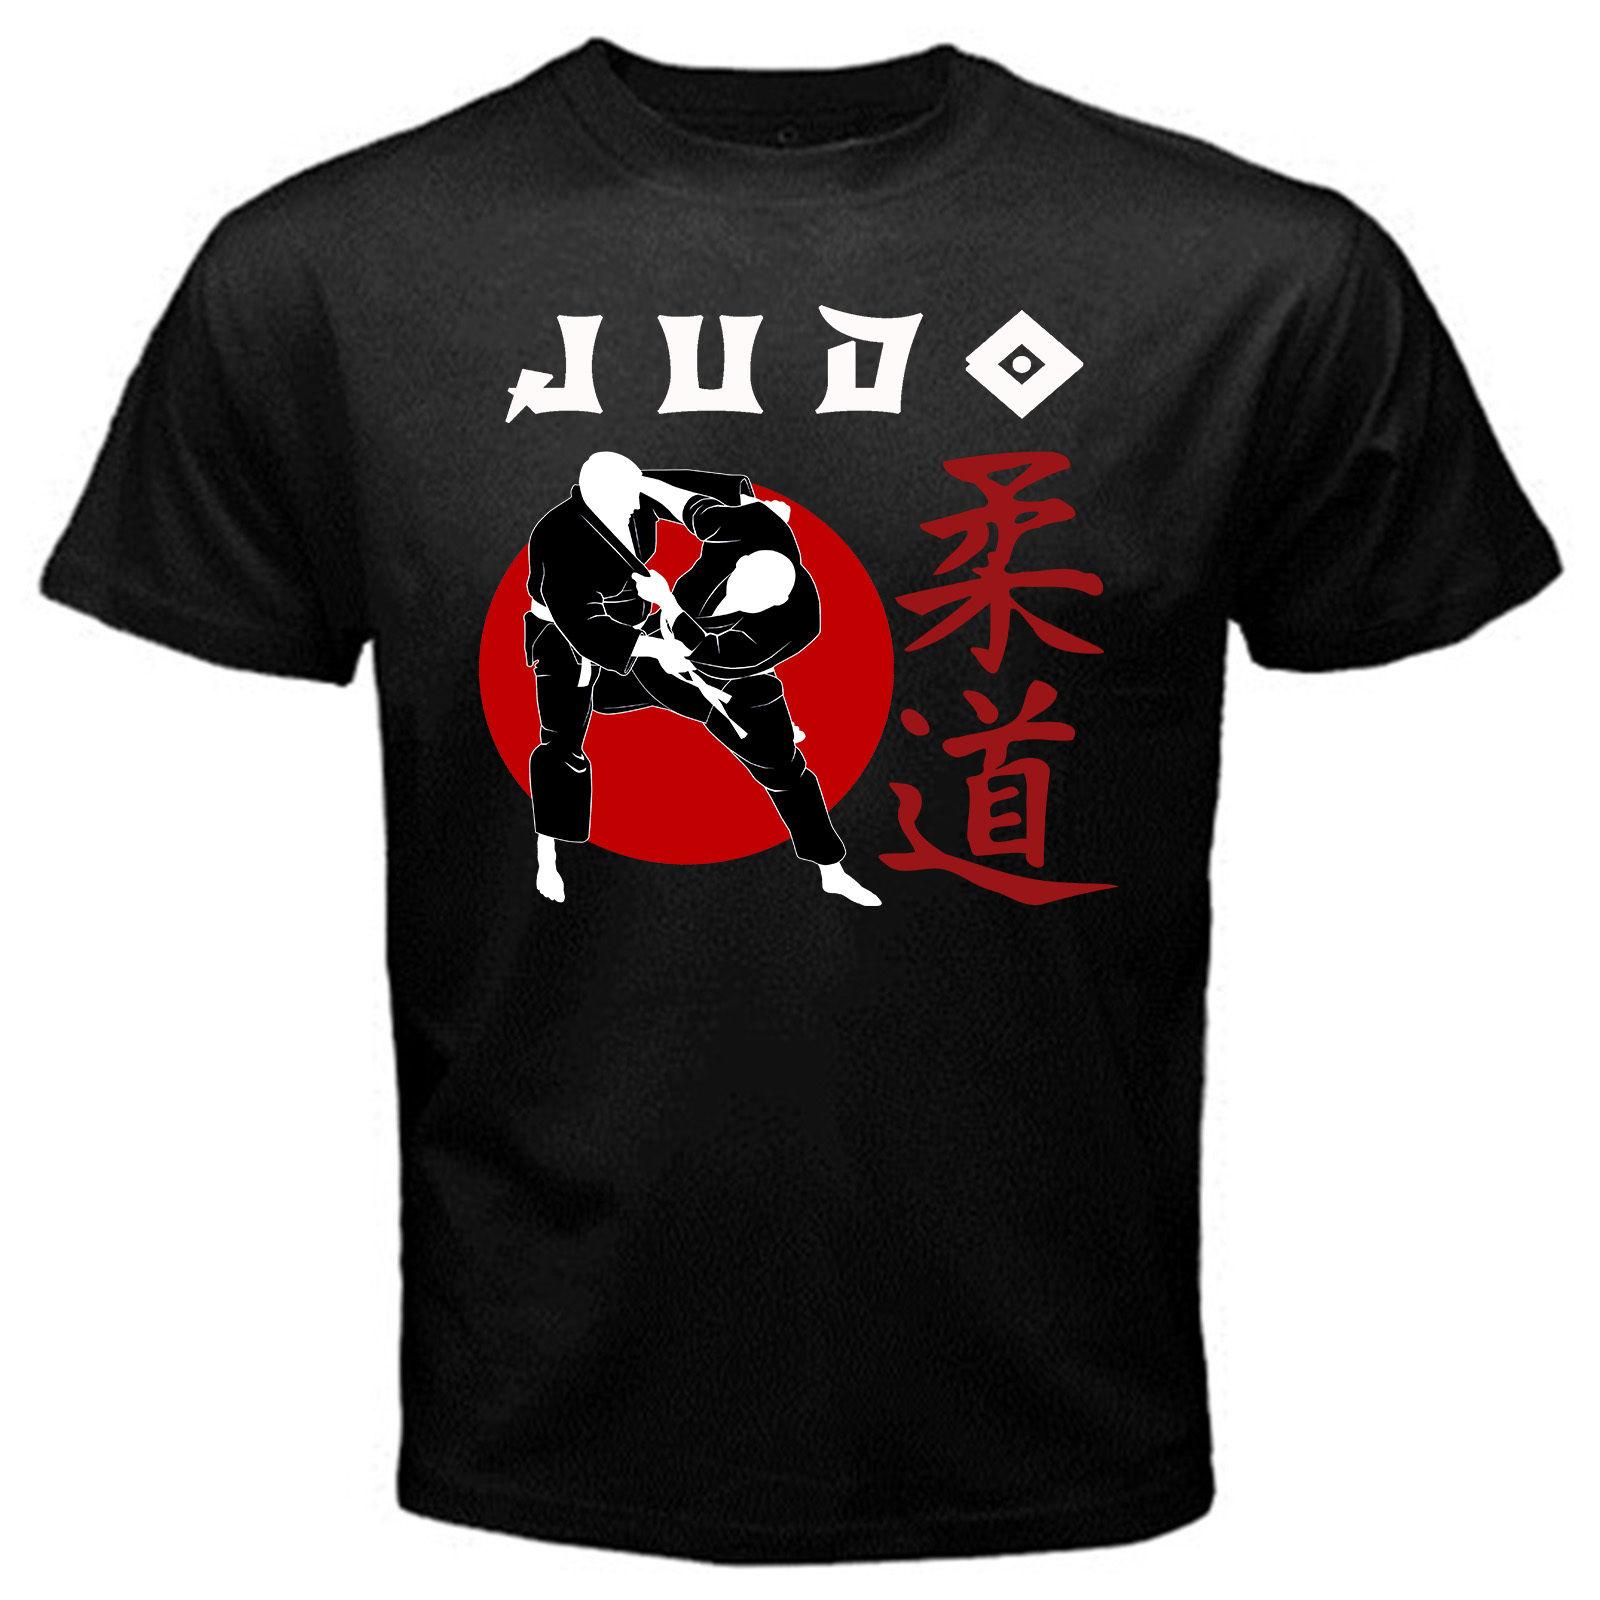 Judo japonés deportivo Nippon artes marciales combate guerra autodefensa camiseta negro